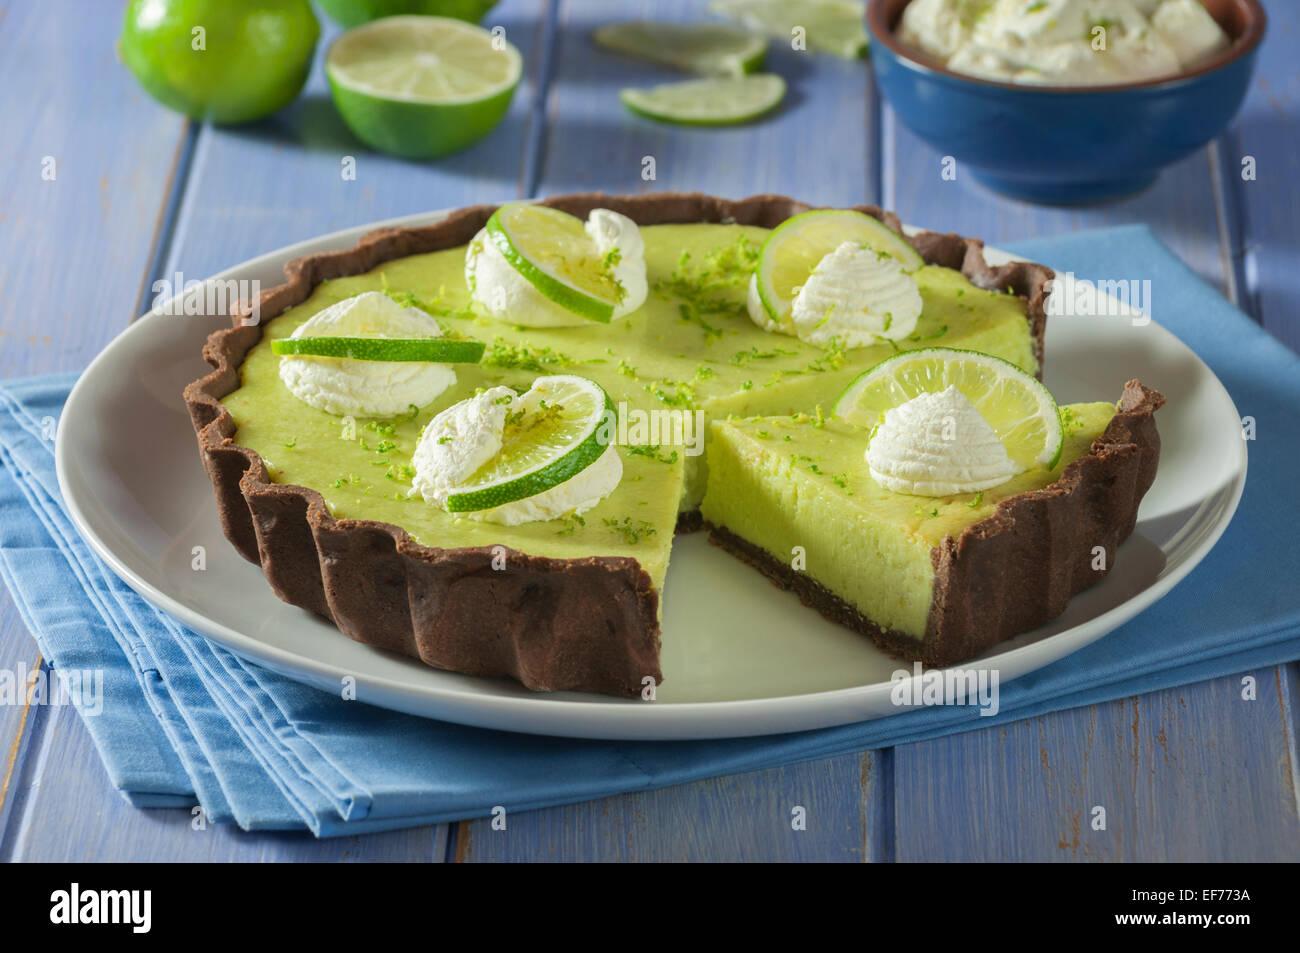 Key lime pie. Citrus dessert USA - Stock Image